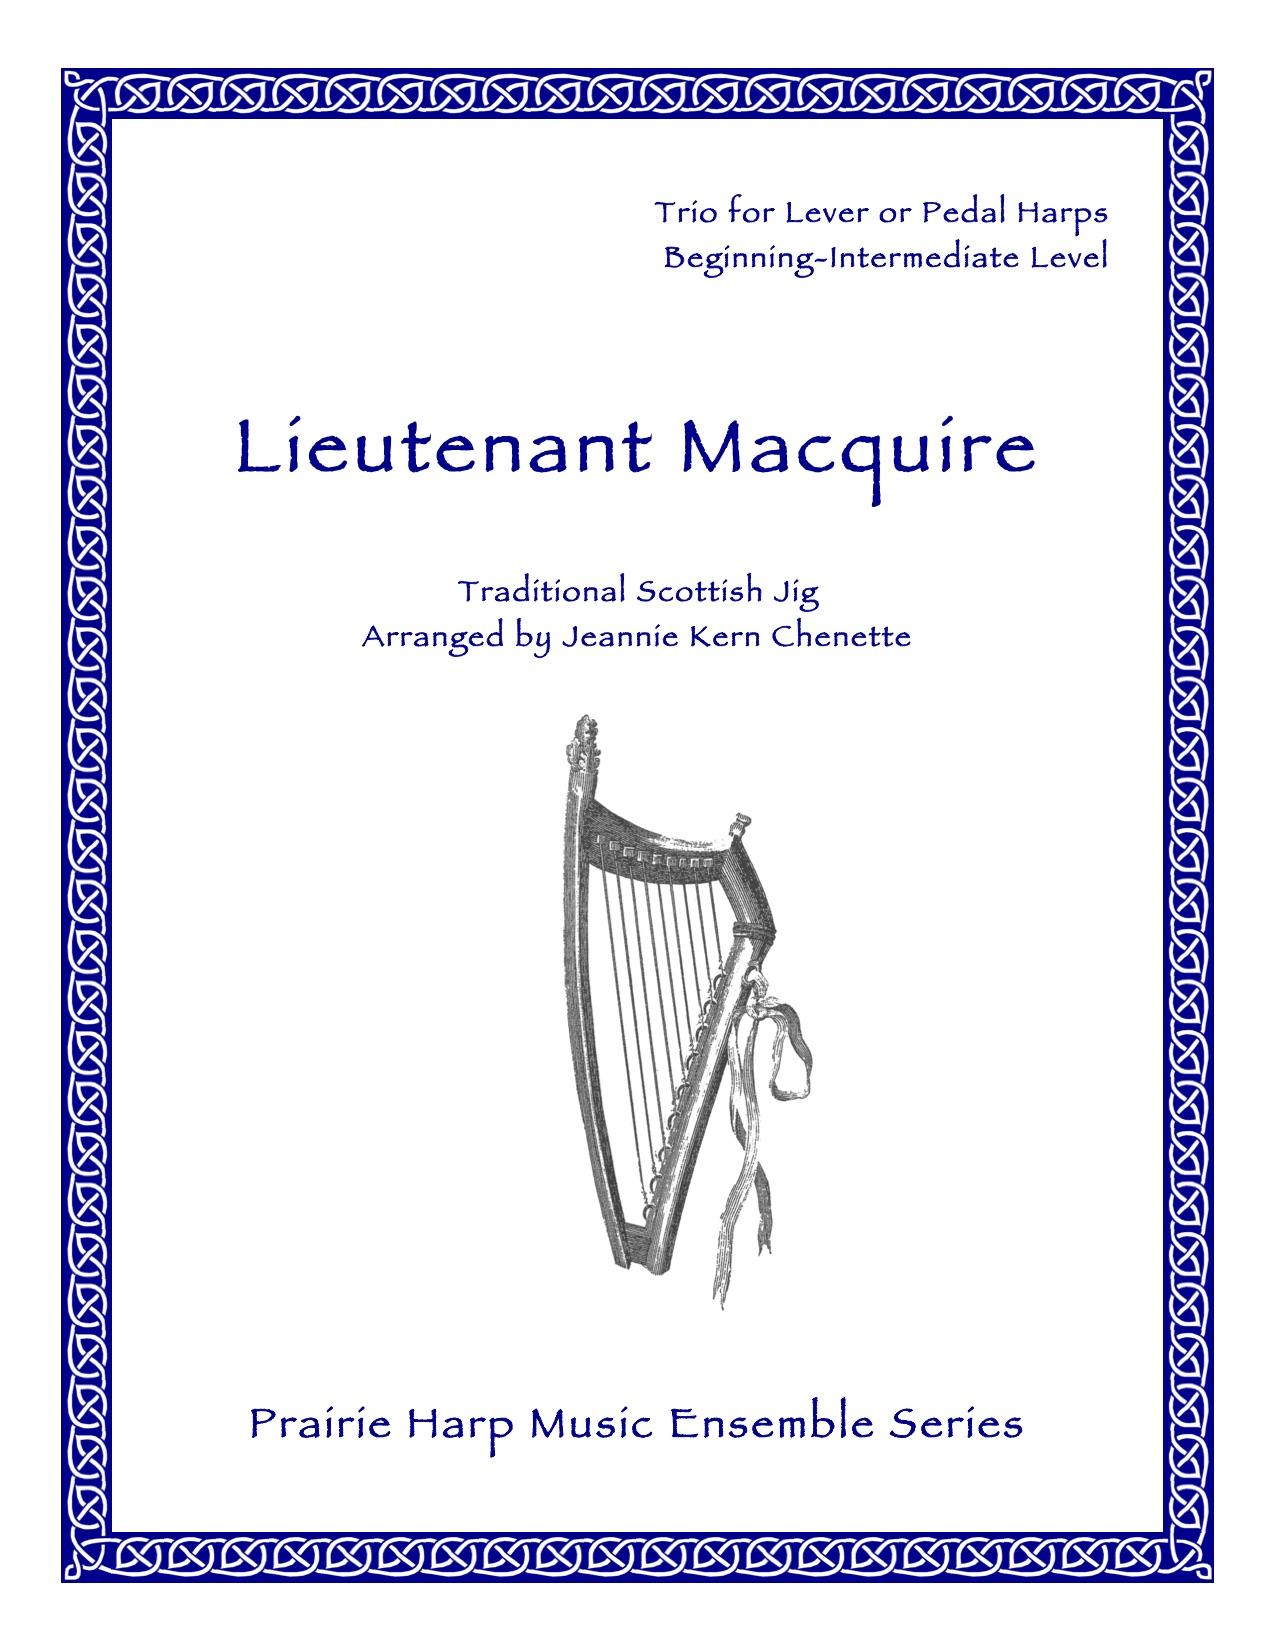 Lt  Macguire | Prairie Harp Music